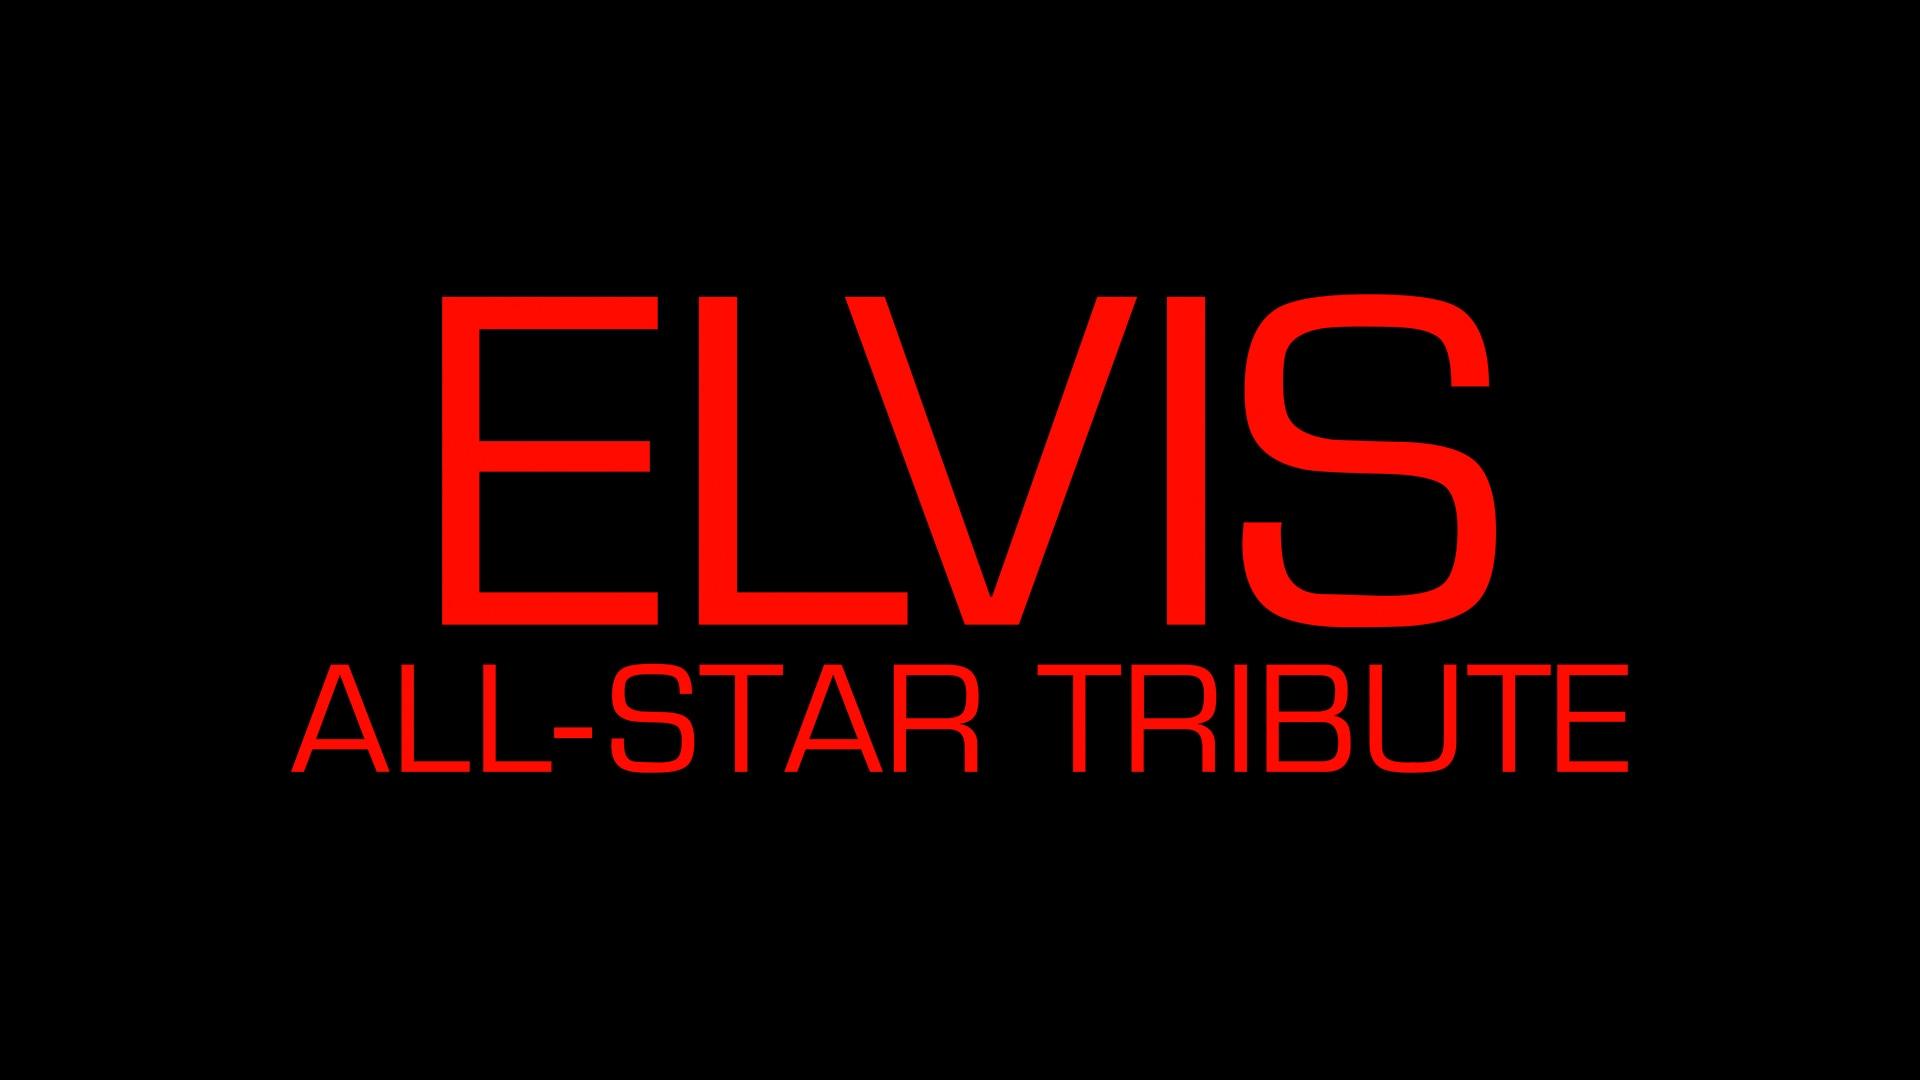 Elvis All-Star Tribute - NBC com